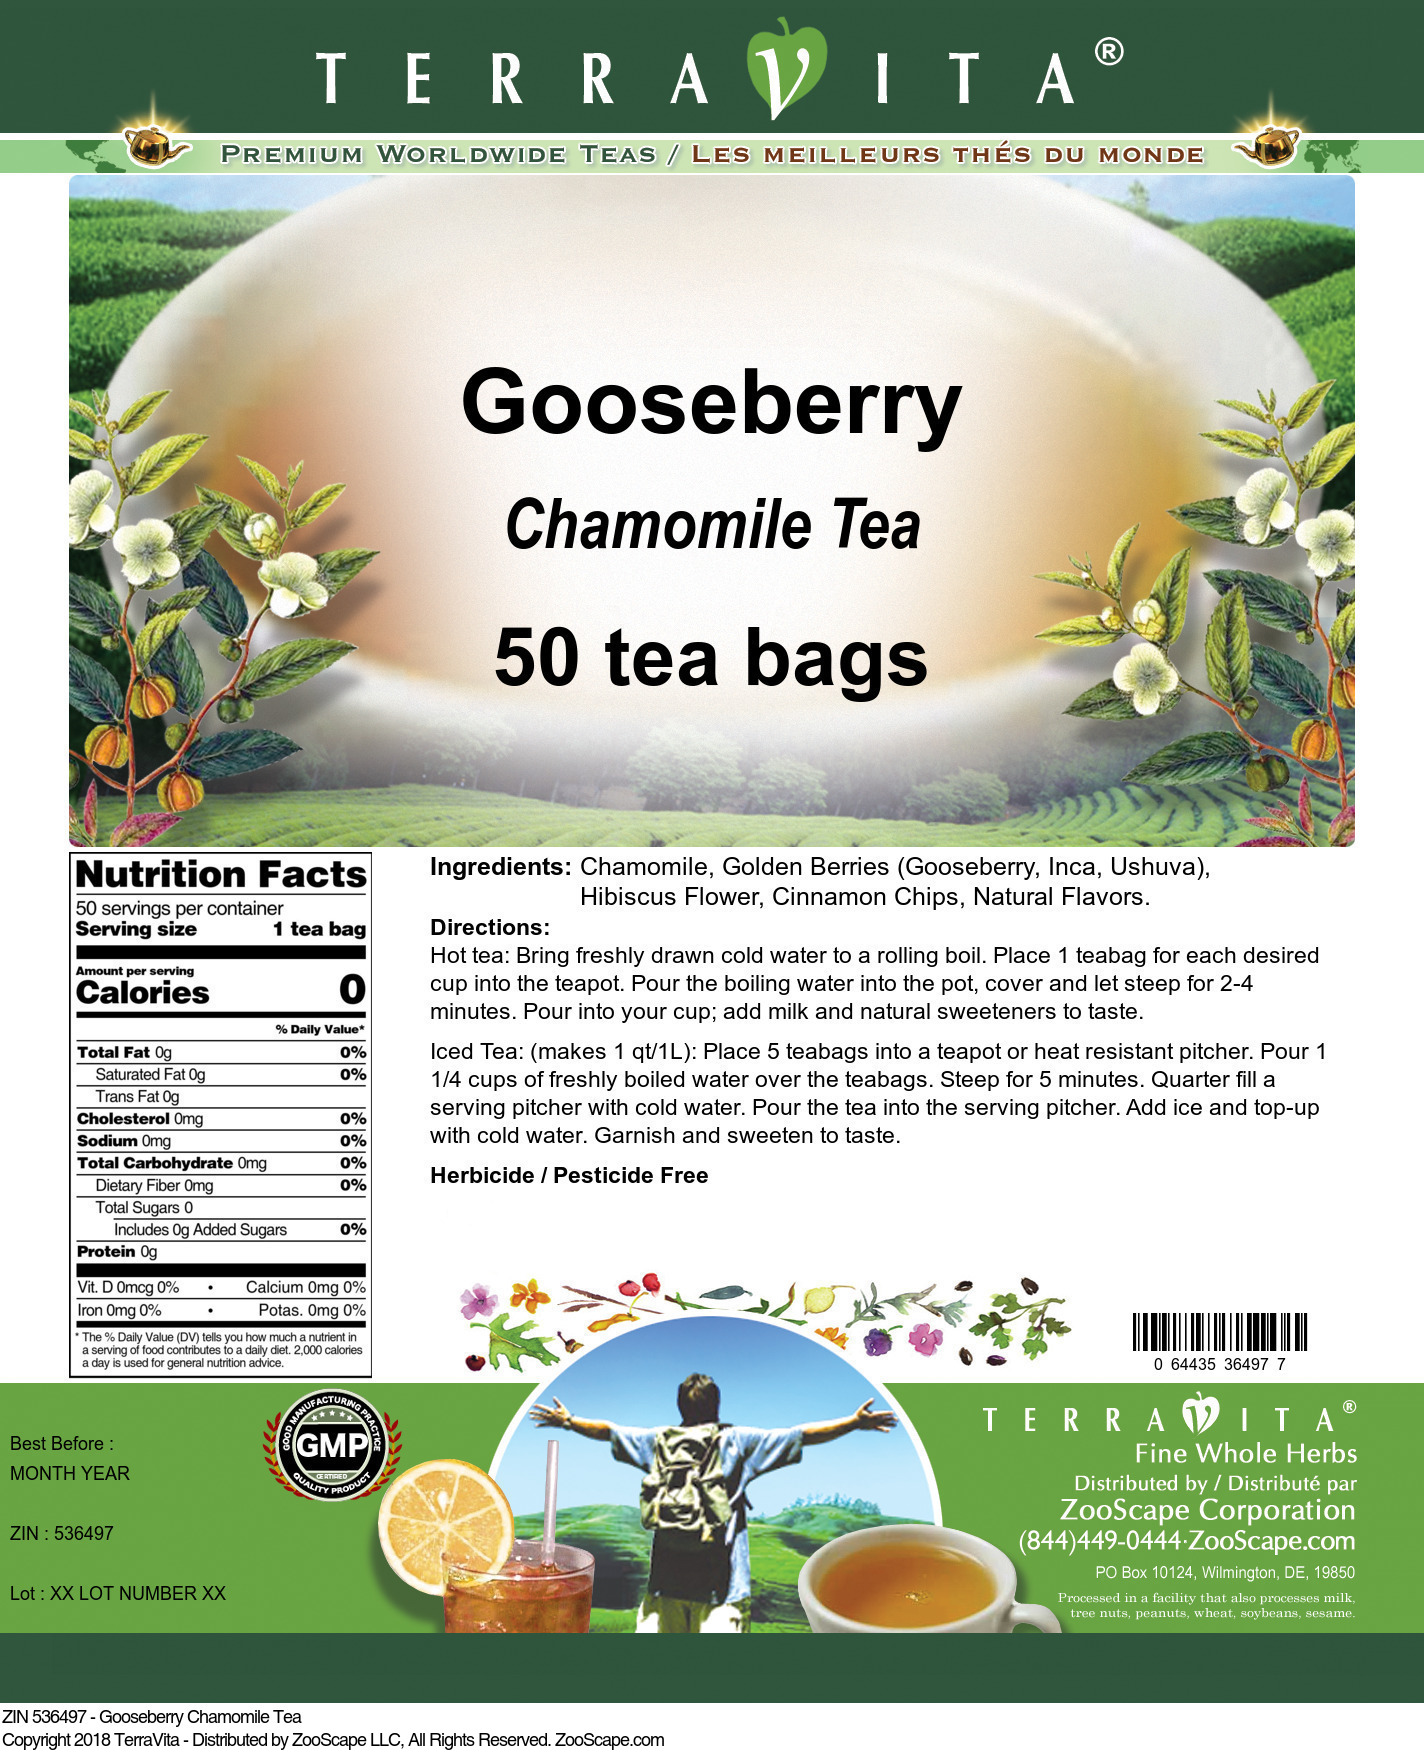 Gooseberry Chamomile Tea